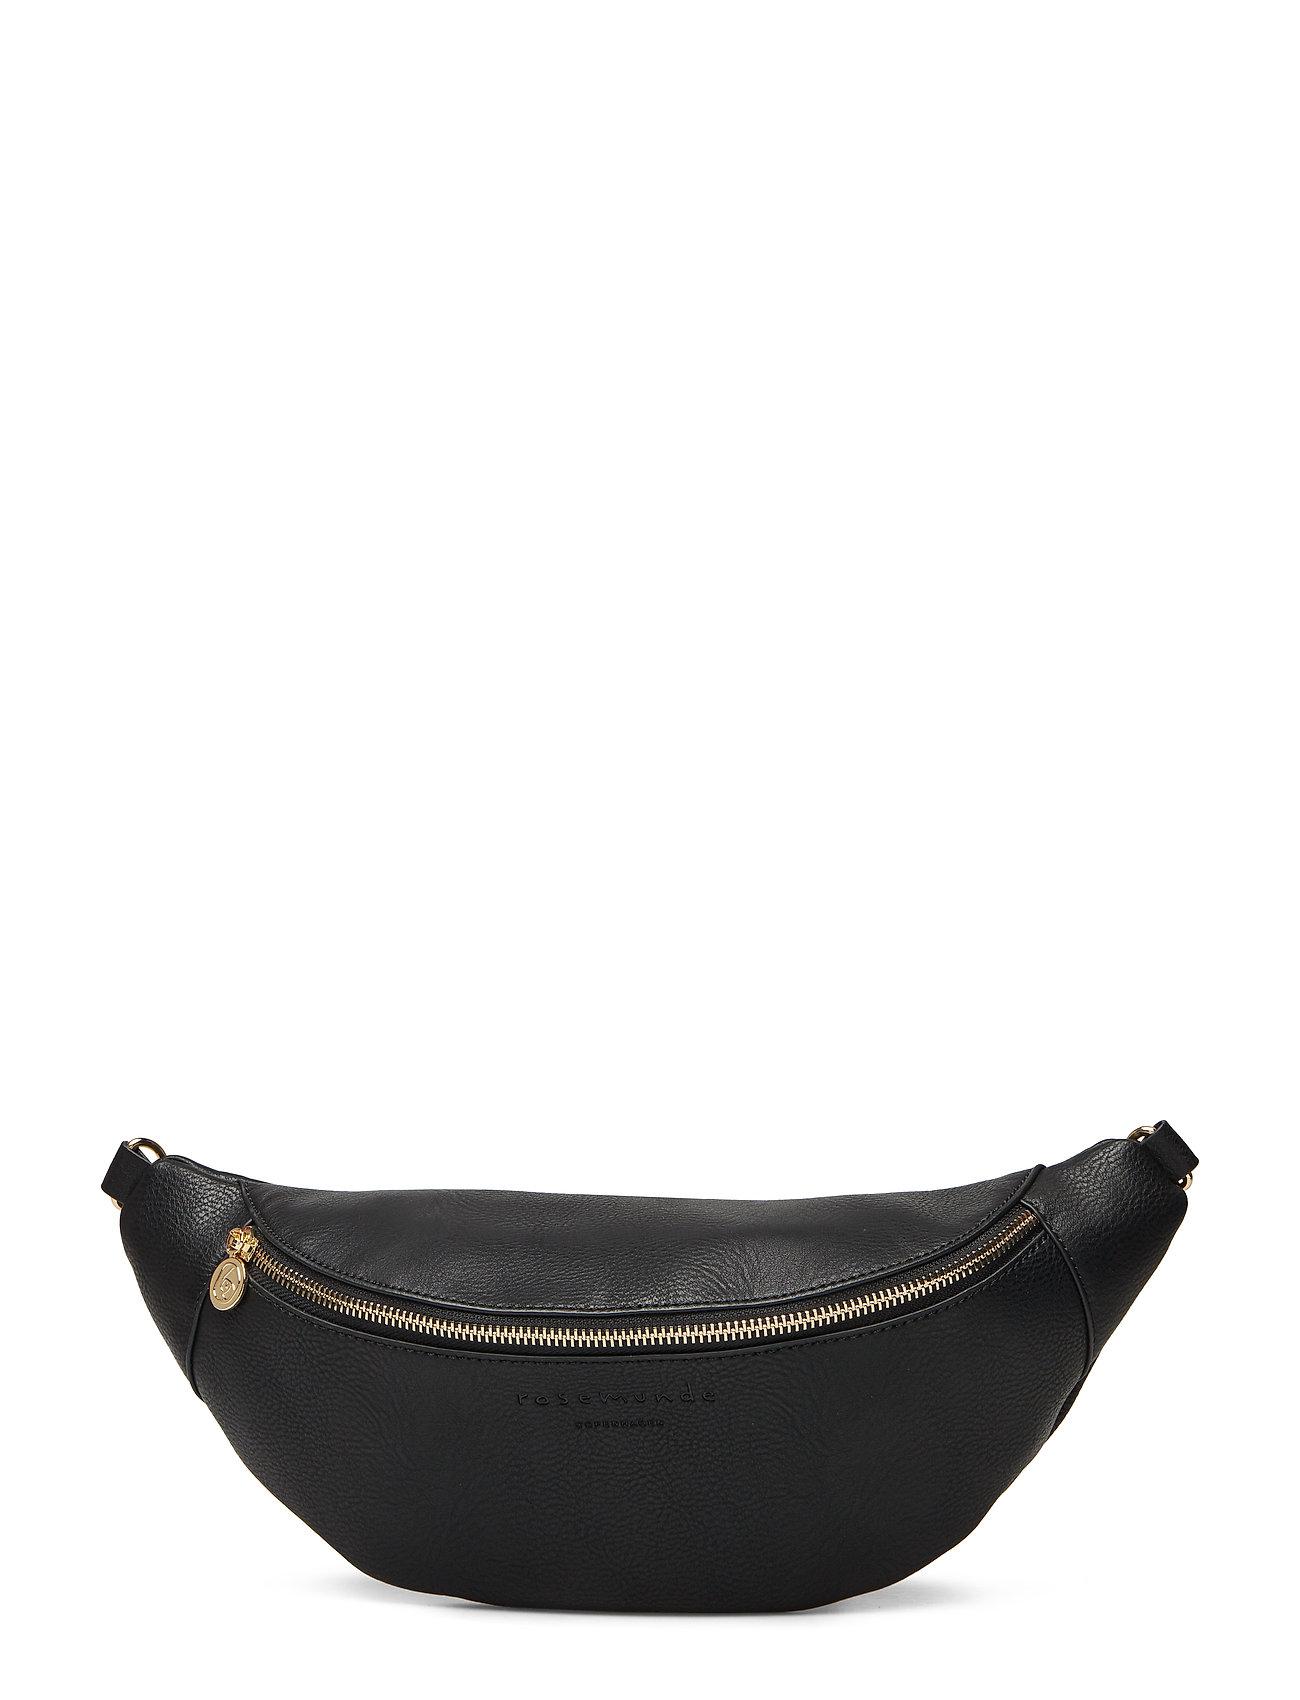 Bag GoldRosemunde Smallblack Smallblack Smallblack Smallblack GoldRosemunde Bag Bag Bag GoldRosemunde GoldRosemunde Bag 1JcTlFK